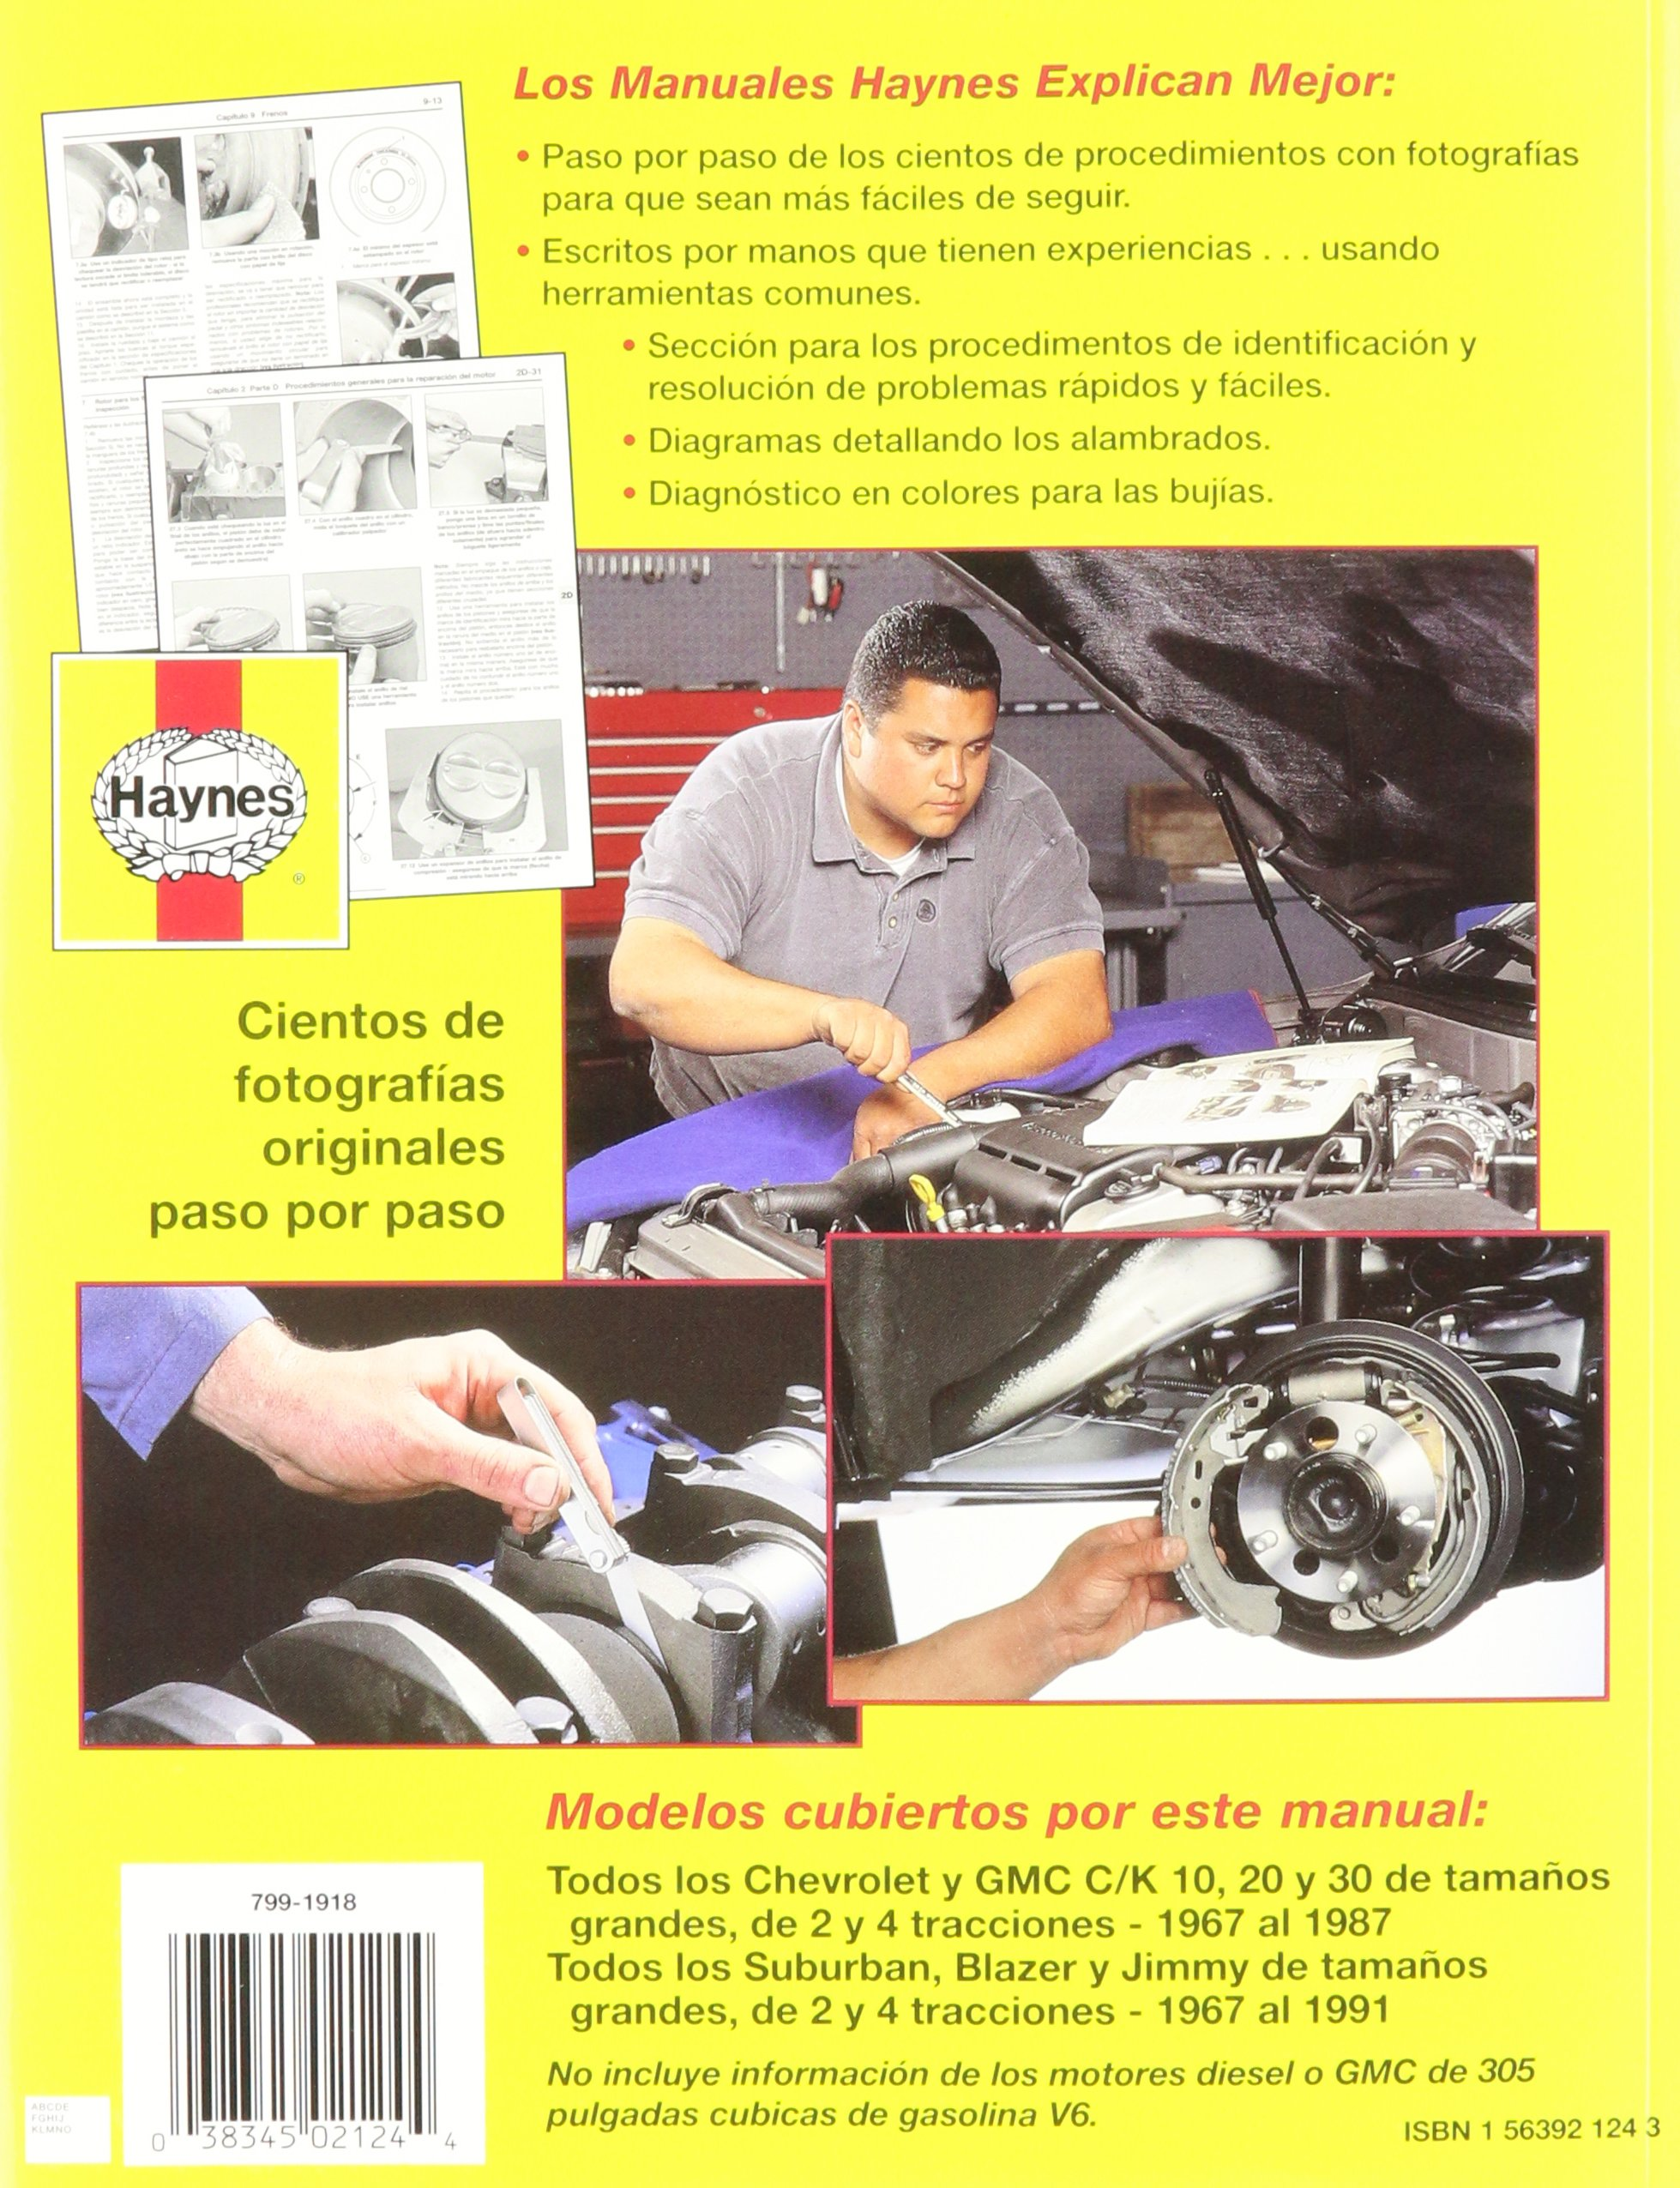 Chevrolet Pickup & Blazer, 6791 (Spanish) (Haynes Repair Manuals): John Haynes: 9781563921247: Amazon.com: Books